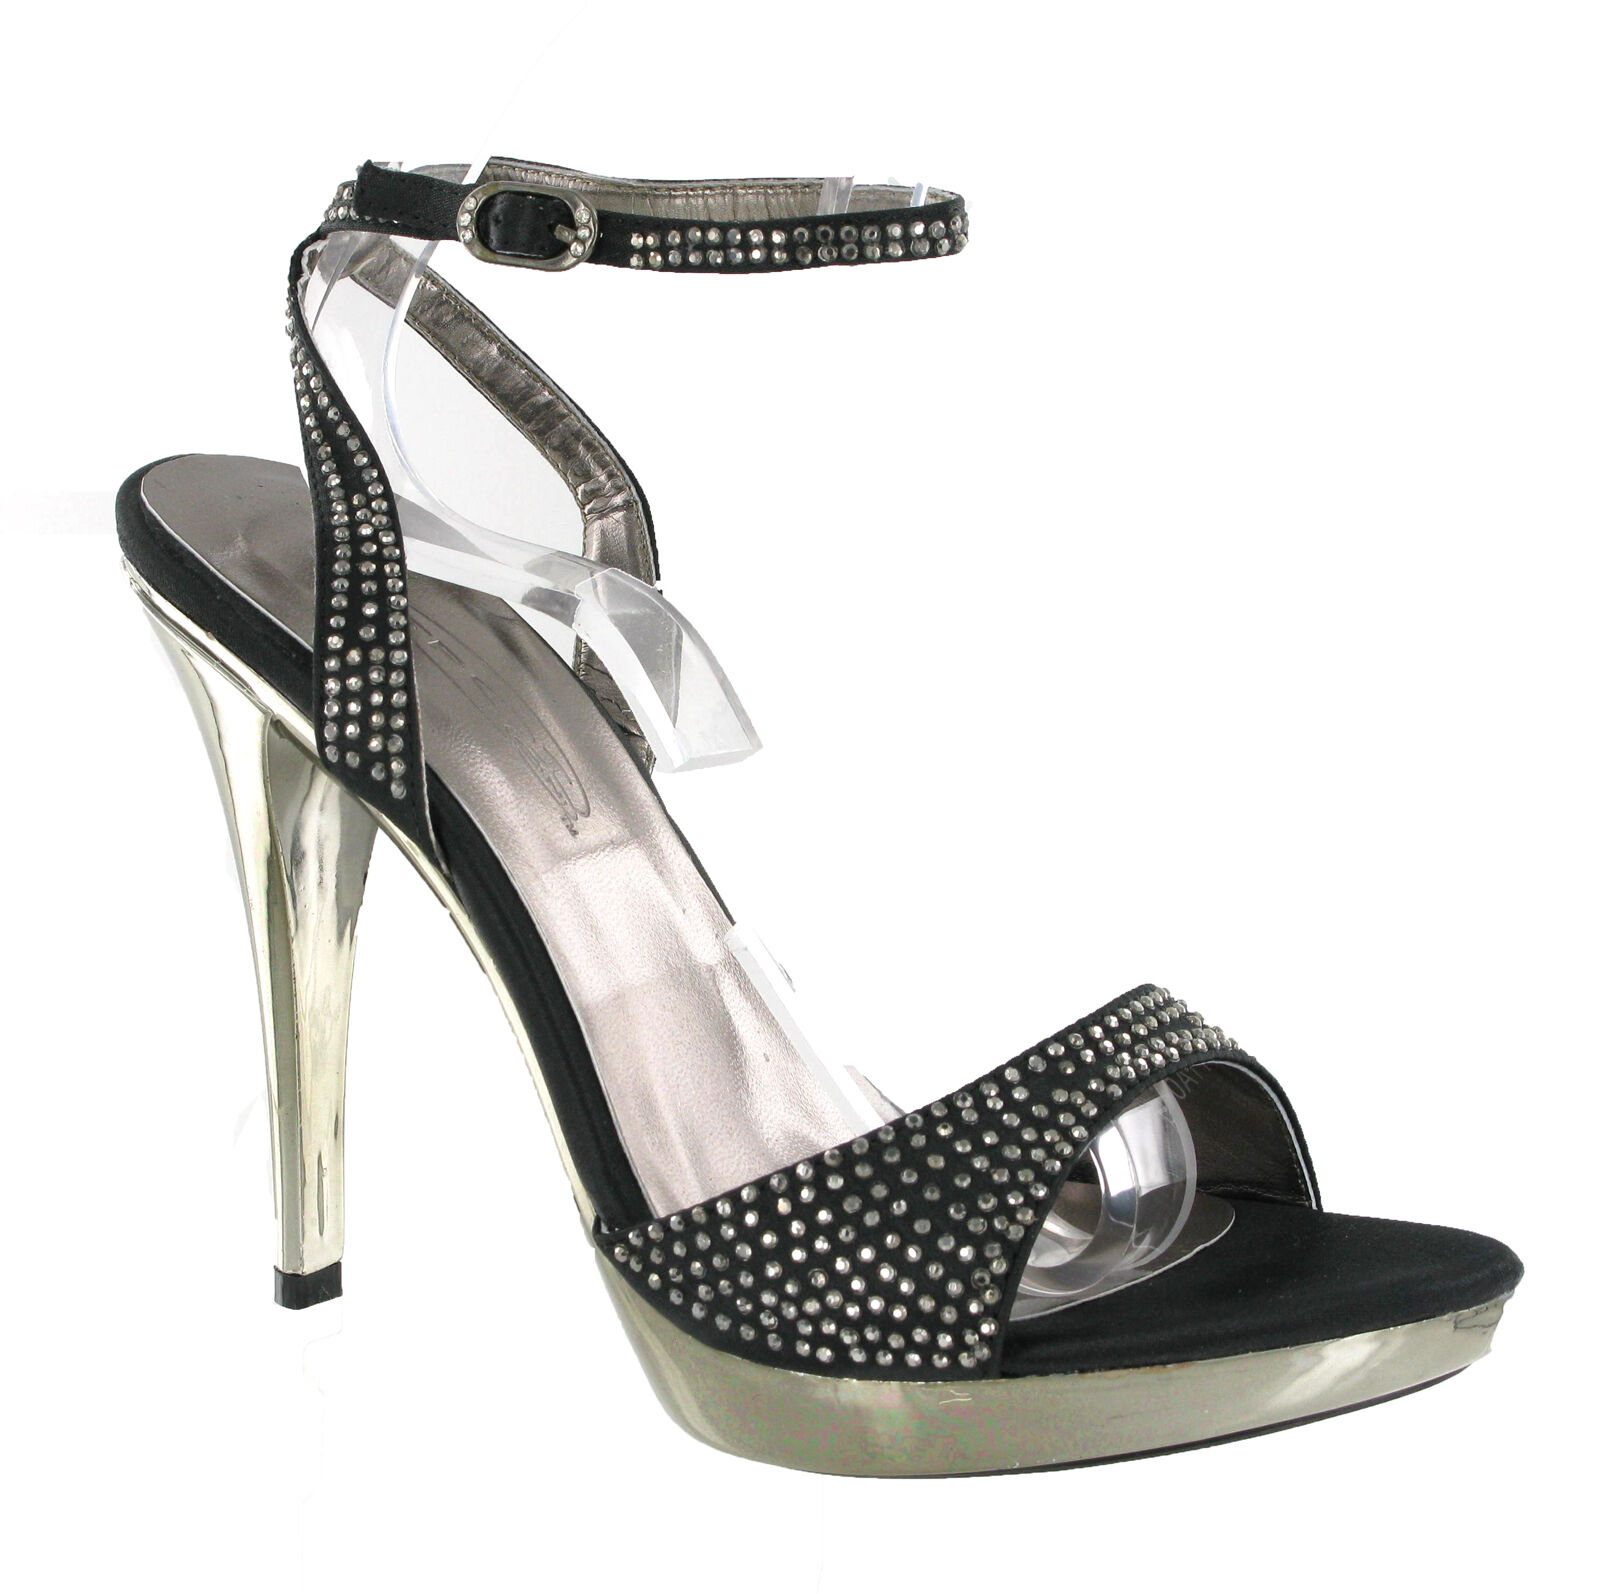 Womens Strap High Heels Stud Design Platform Party CushionedSandals Shoes UK 3-8